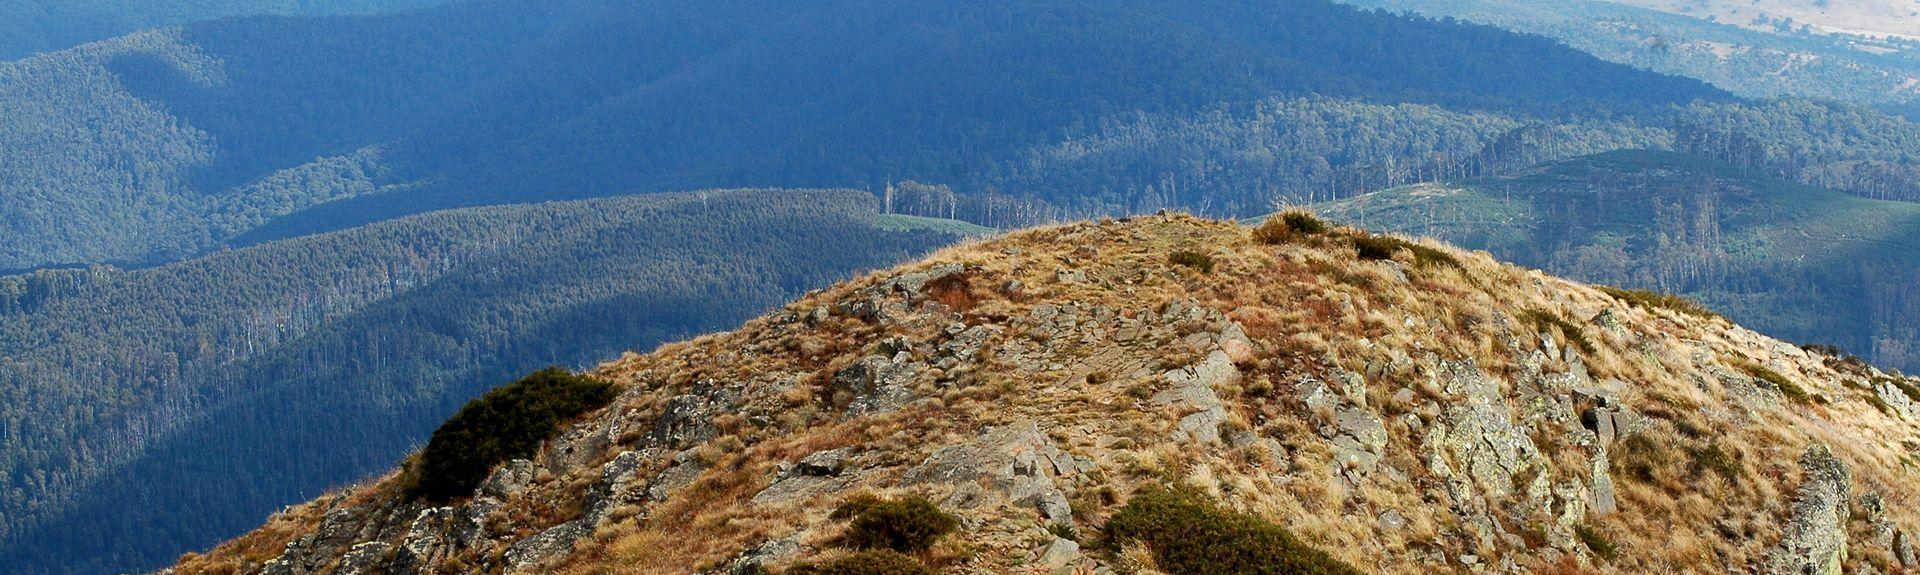 Skipisten Mt. Buller, Mount Buller, Victoria, Australien